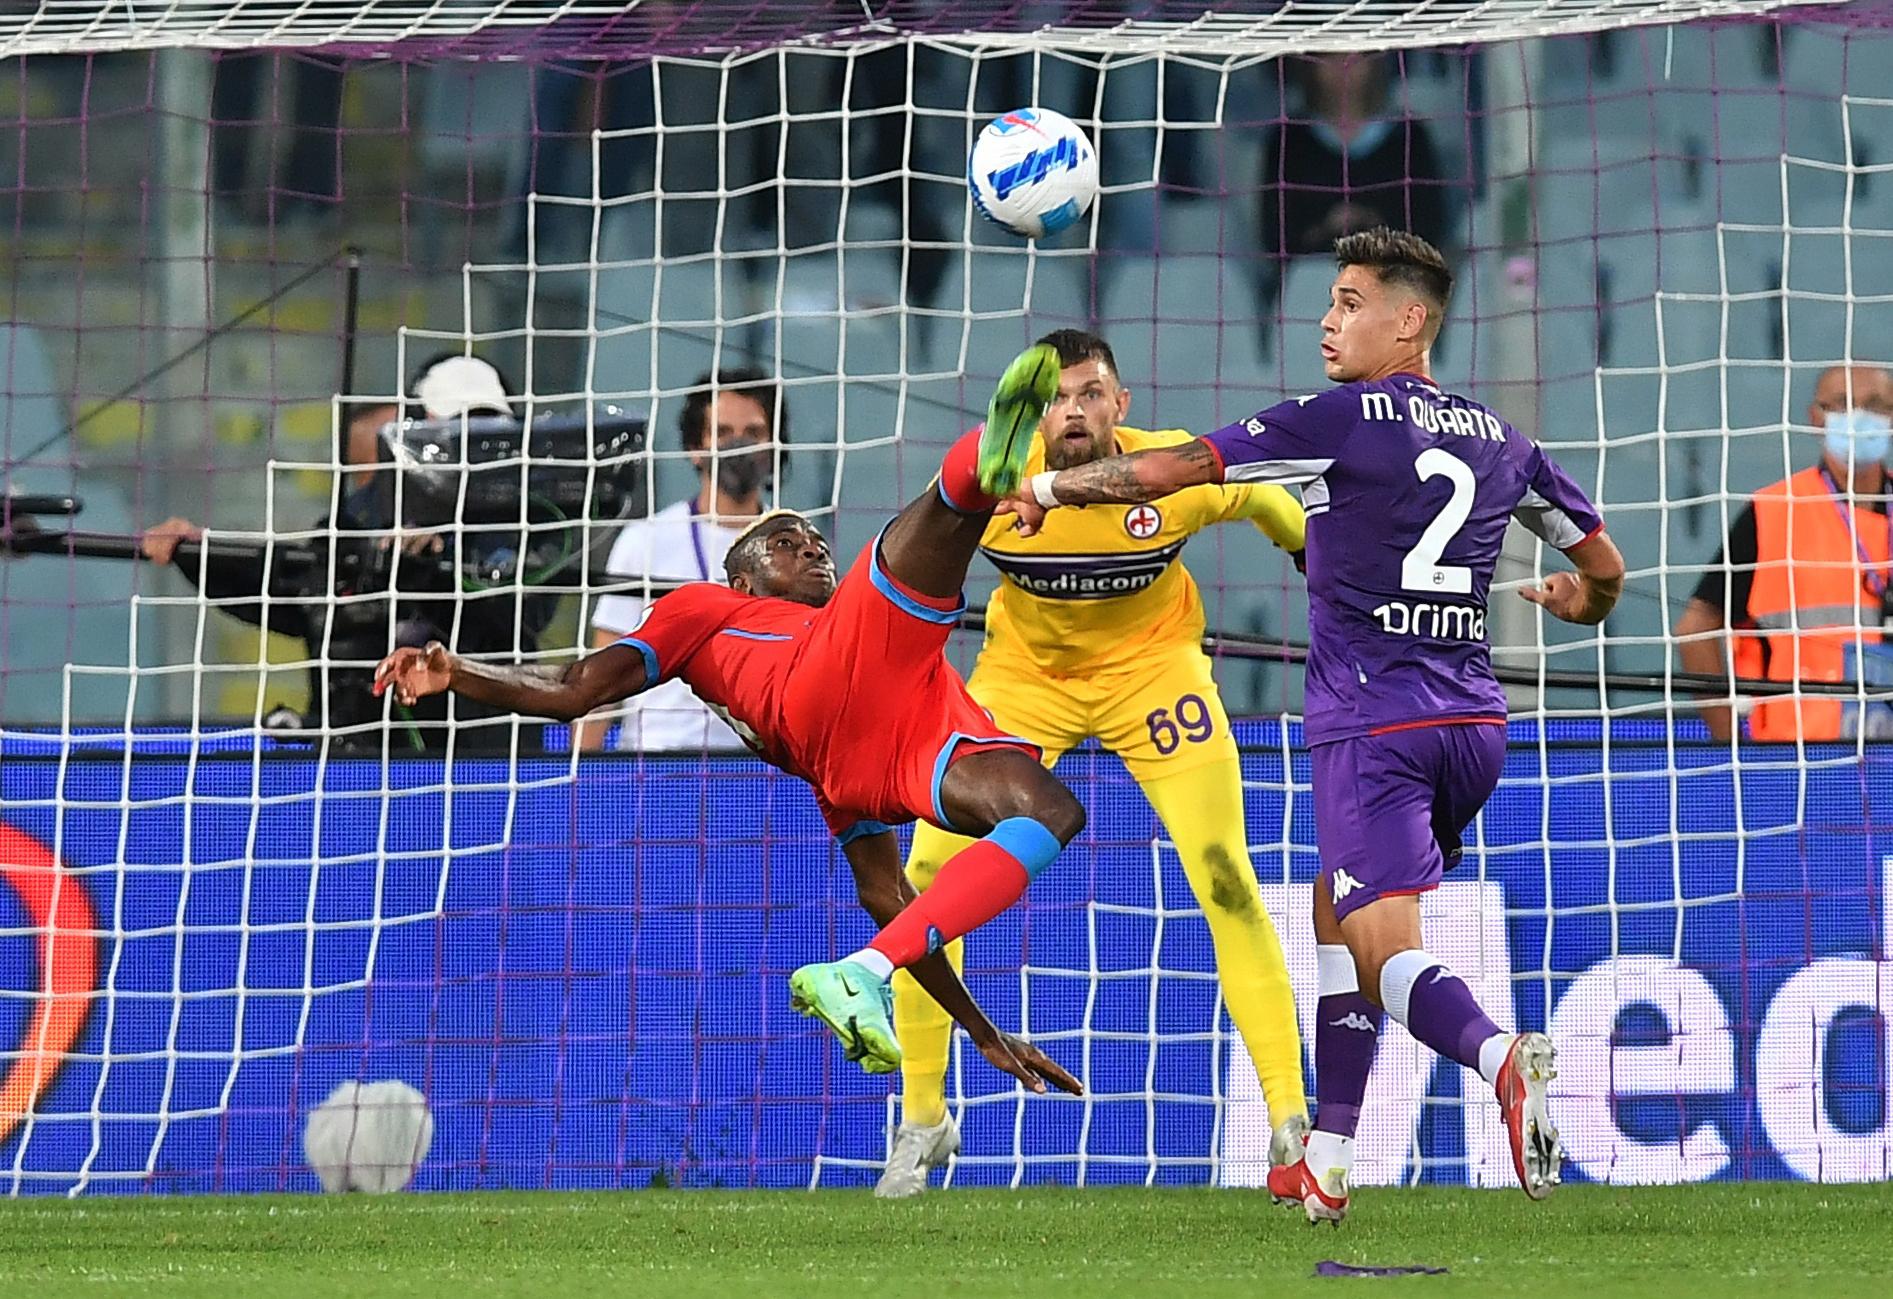 Soccer Football - Serie A - Fiorentina v Napoli - Stadio Artemio Franchi, Florence, Italy - October 3, 2021  Napoli's Victor Osimhen shoots at goal REUTERS/Jennifer Lorenzini